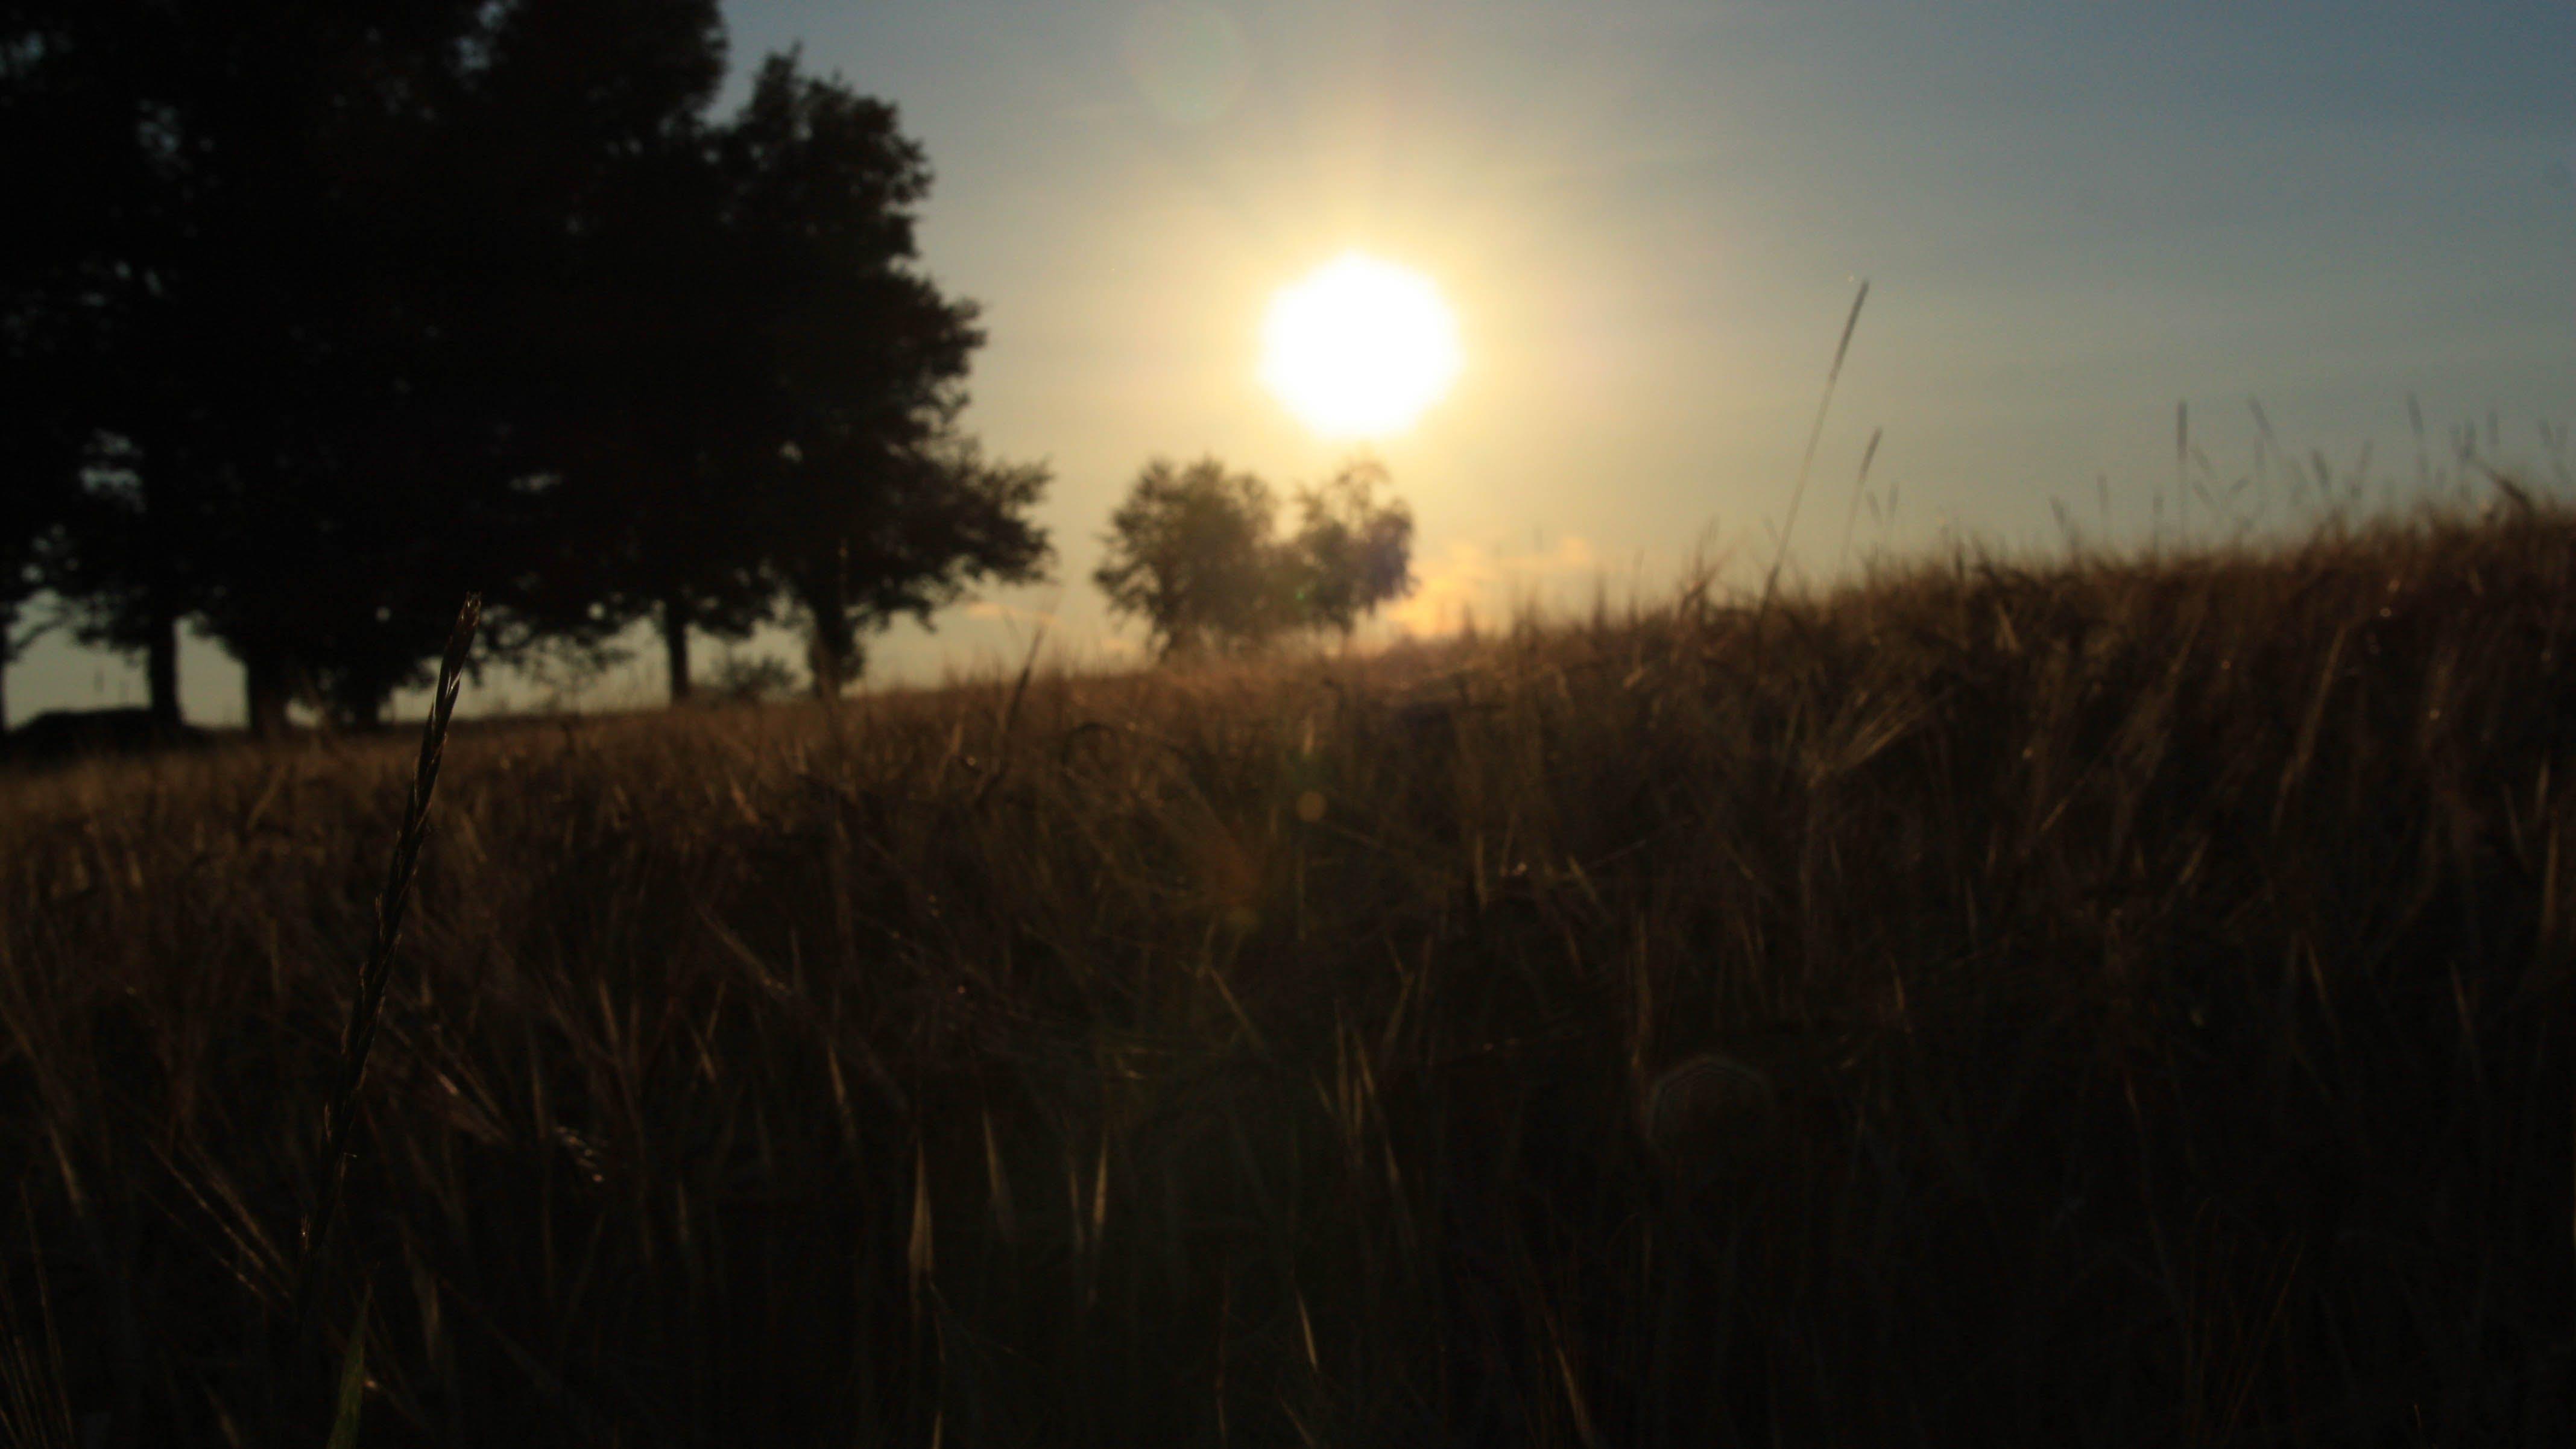 Kostenloses Stock Foto zu abendsonne, feld, felder, natur